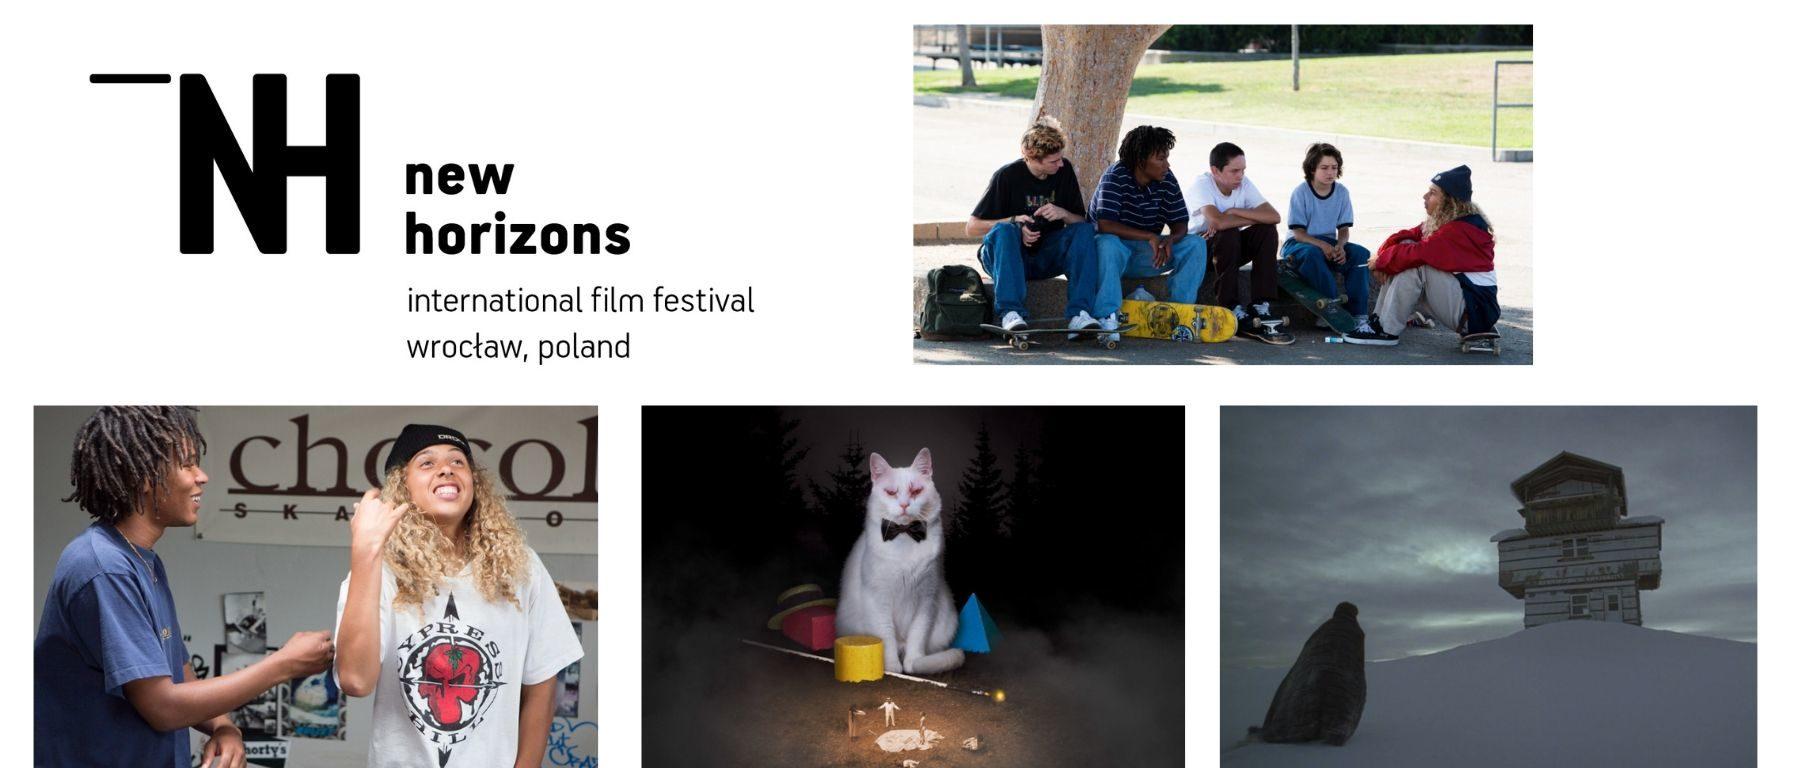 new horizons international film festival 2019